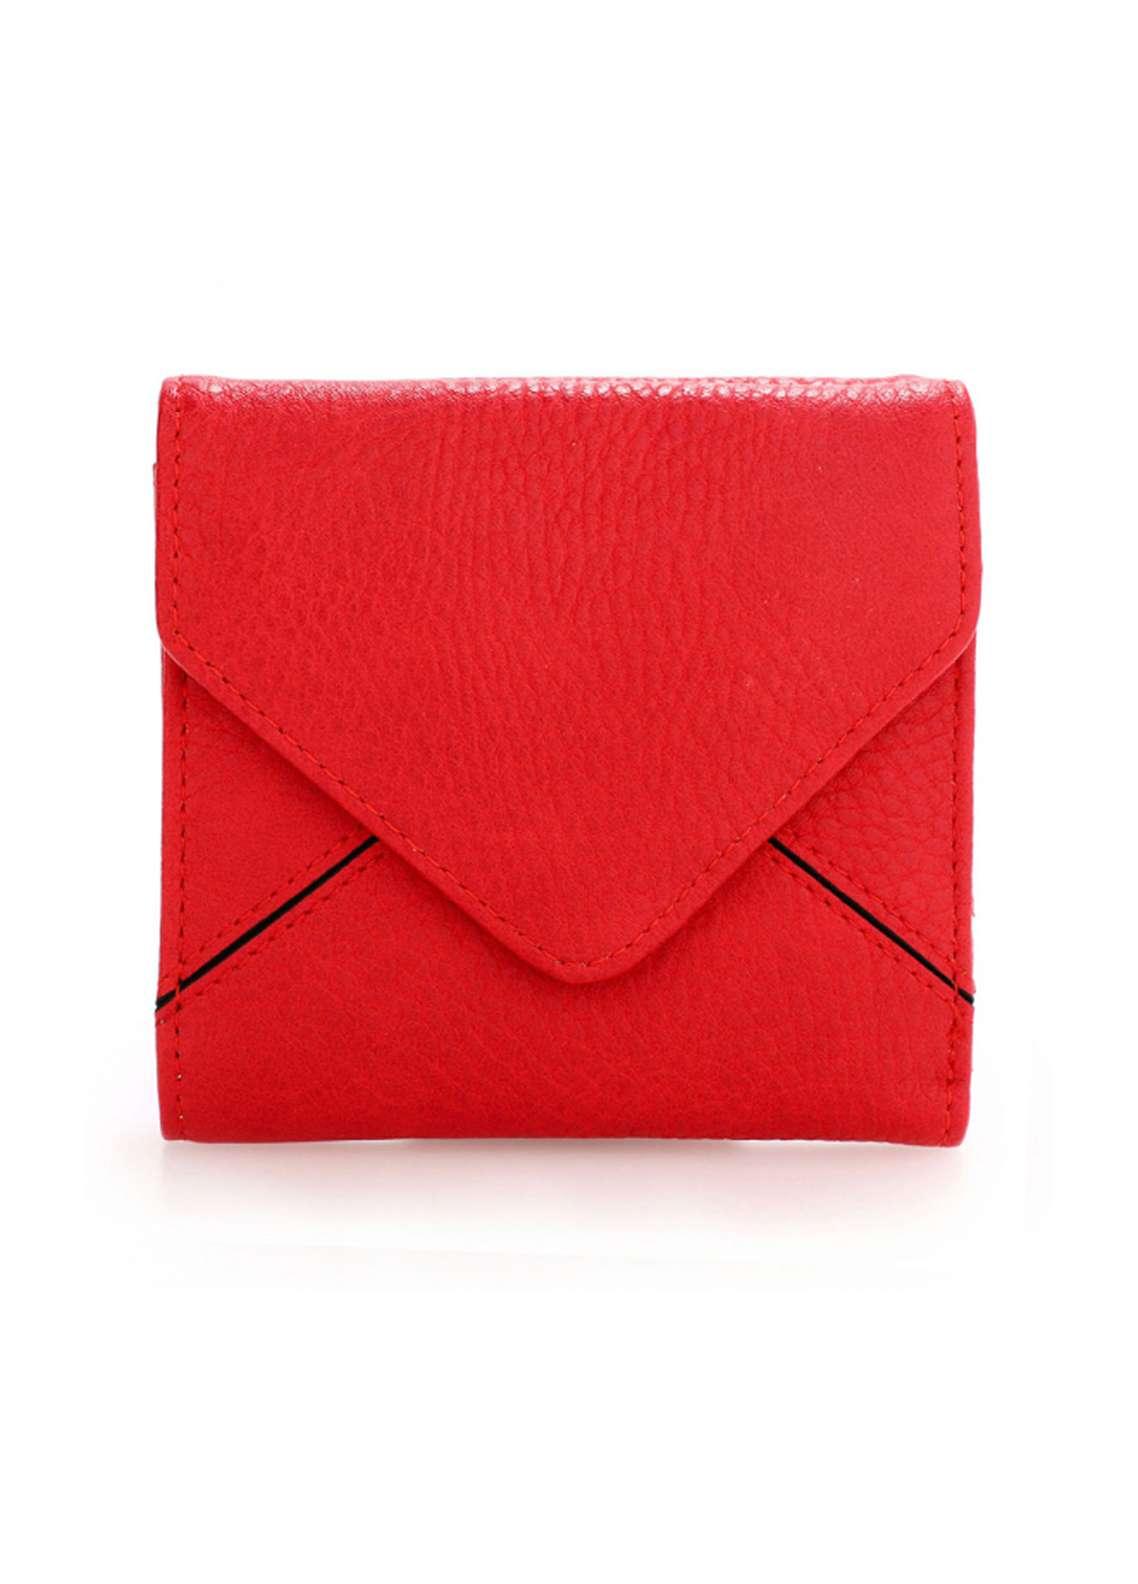 Anna Grace London Faux Leather Envelop Purse Wallets  for Women  Red with Plain Texture